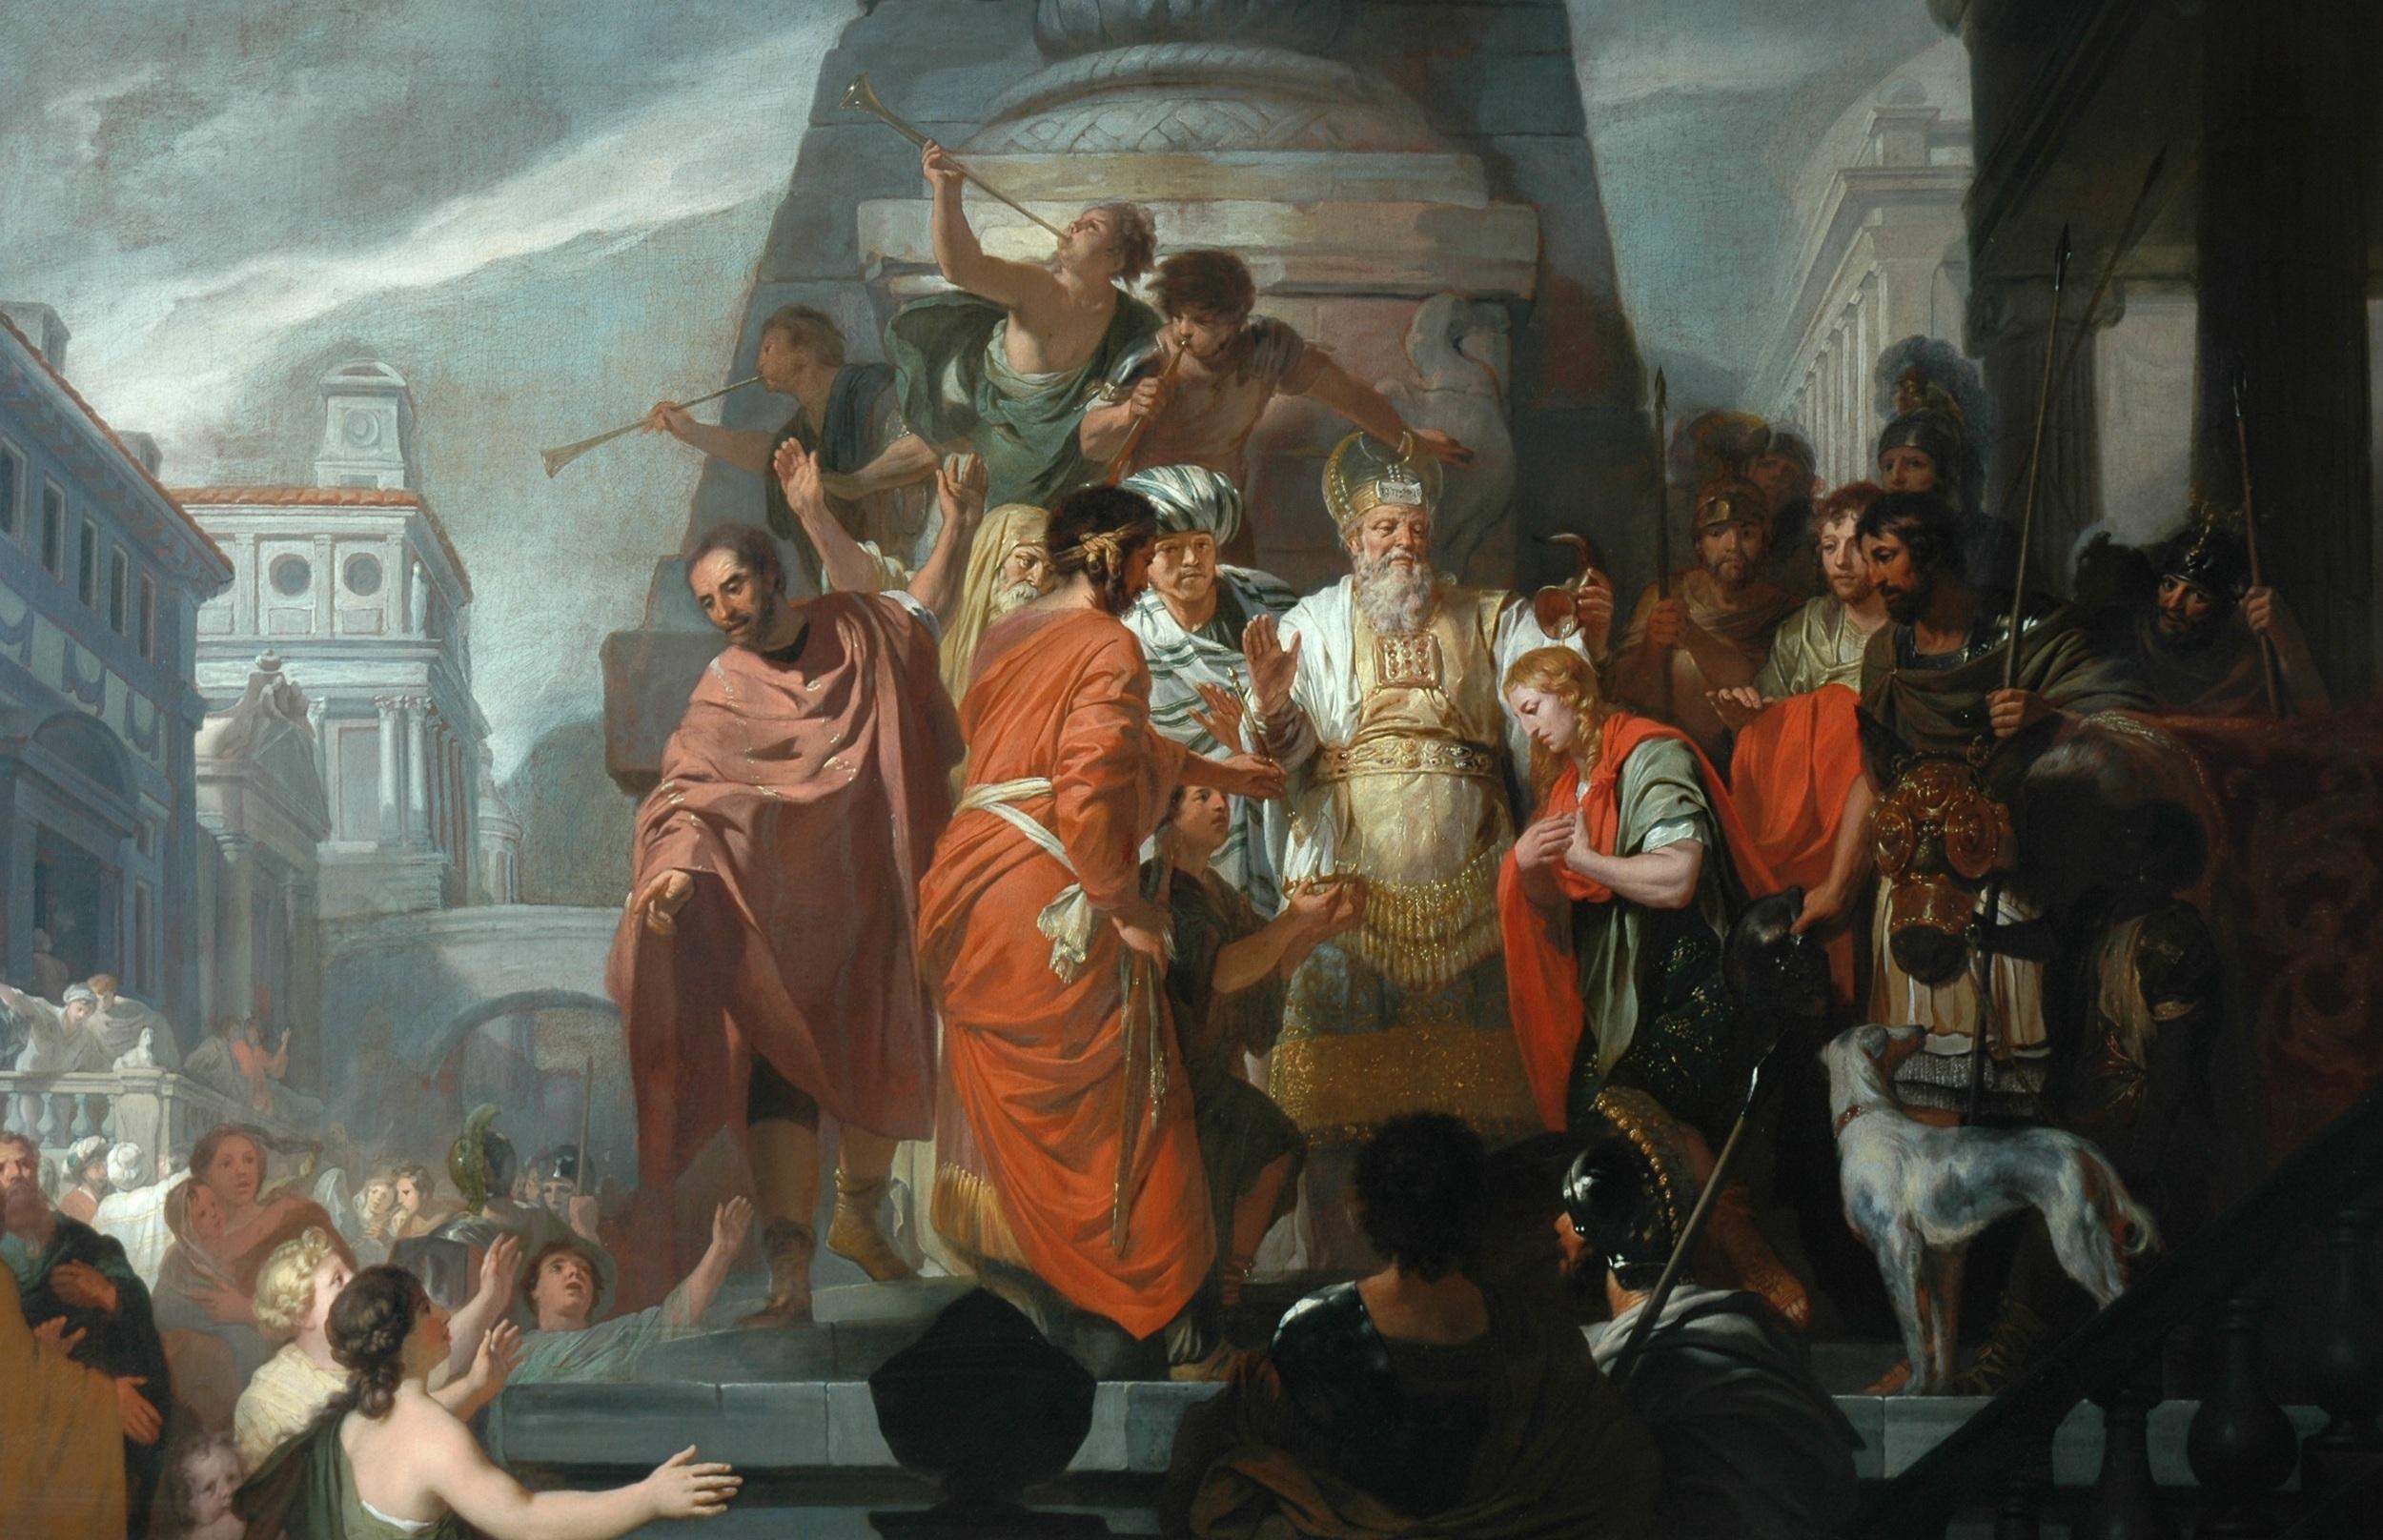 gerard de lairesse, The anointing of solomon © cartwright hall art gallery, bradford